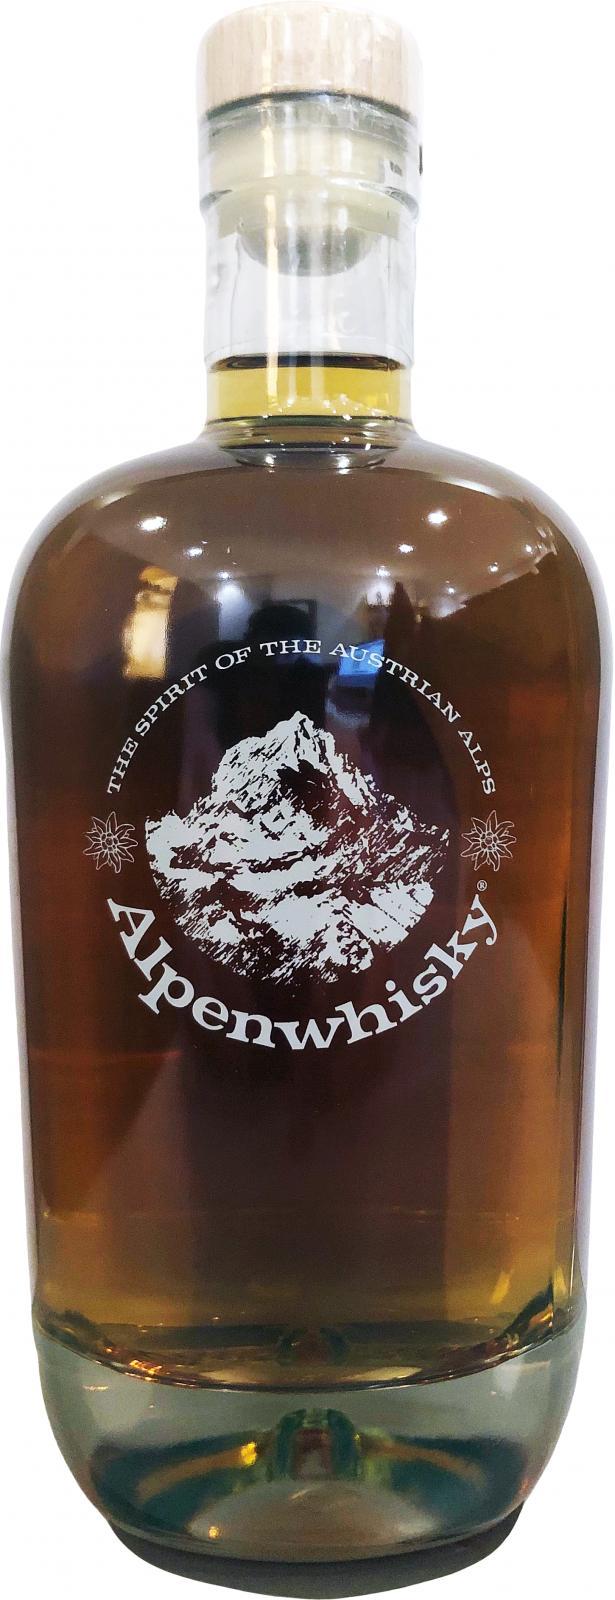 Alpenwhisky 2015